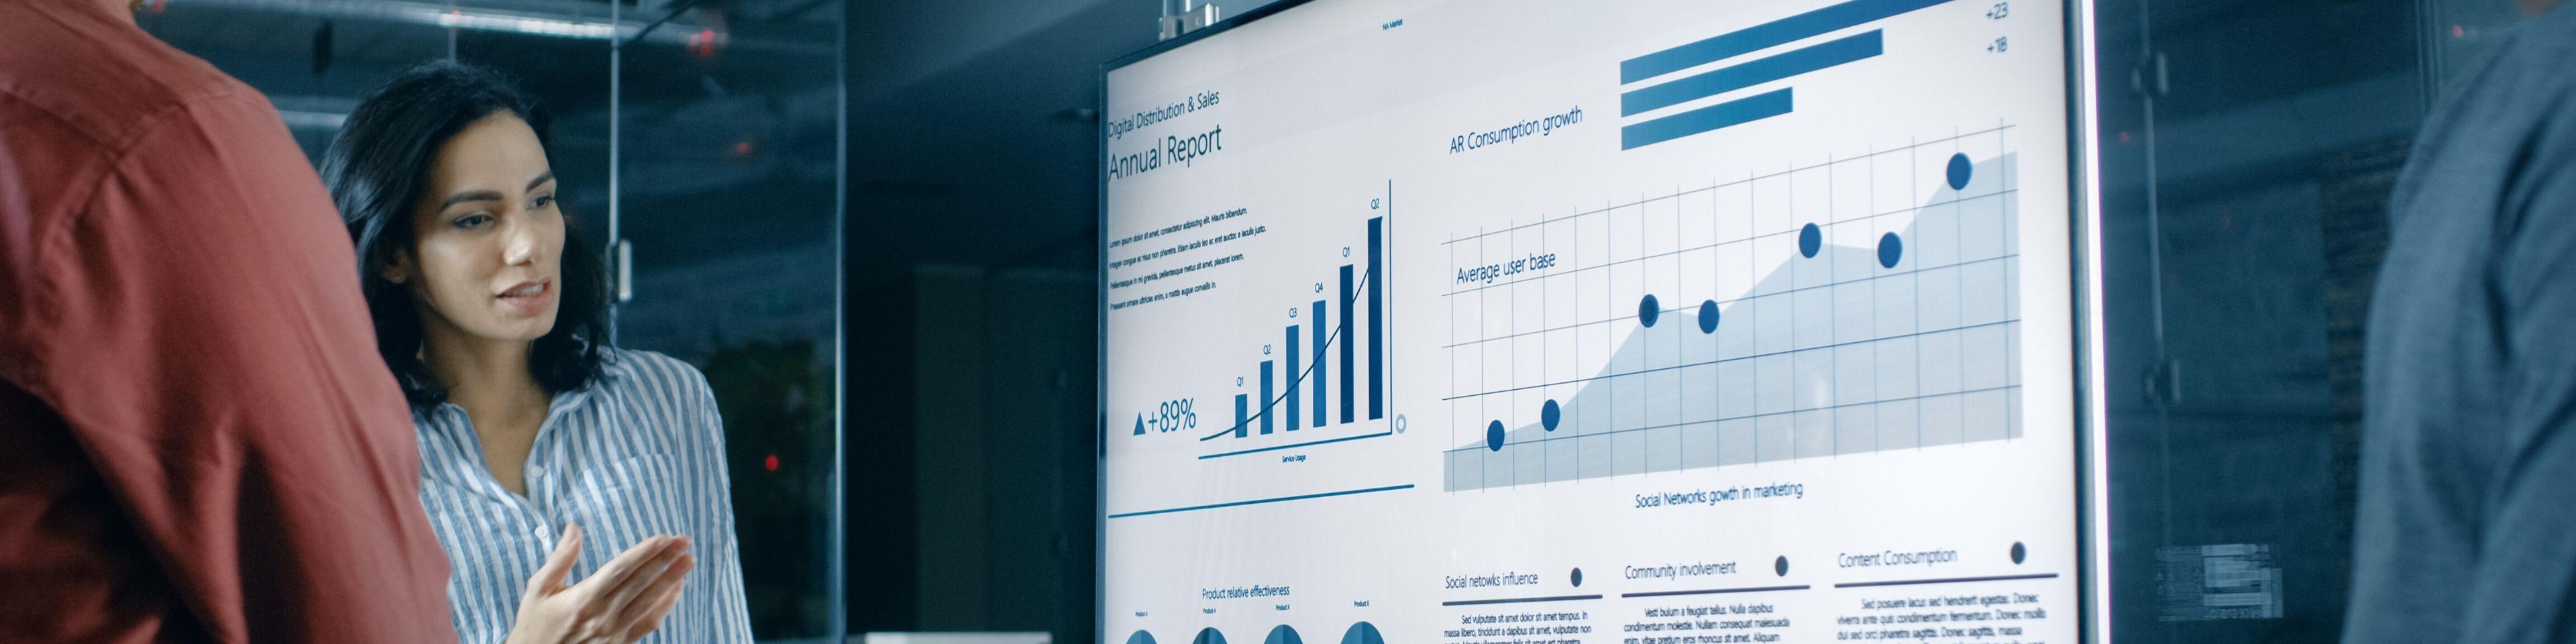 business meeting looking at data charts